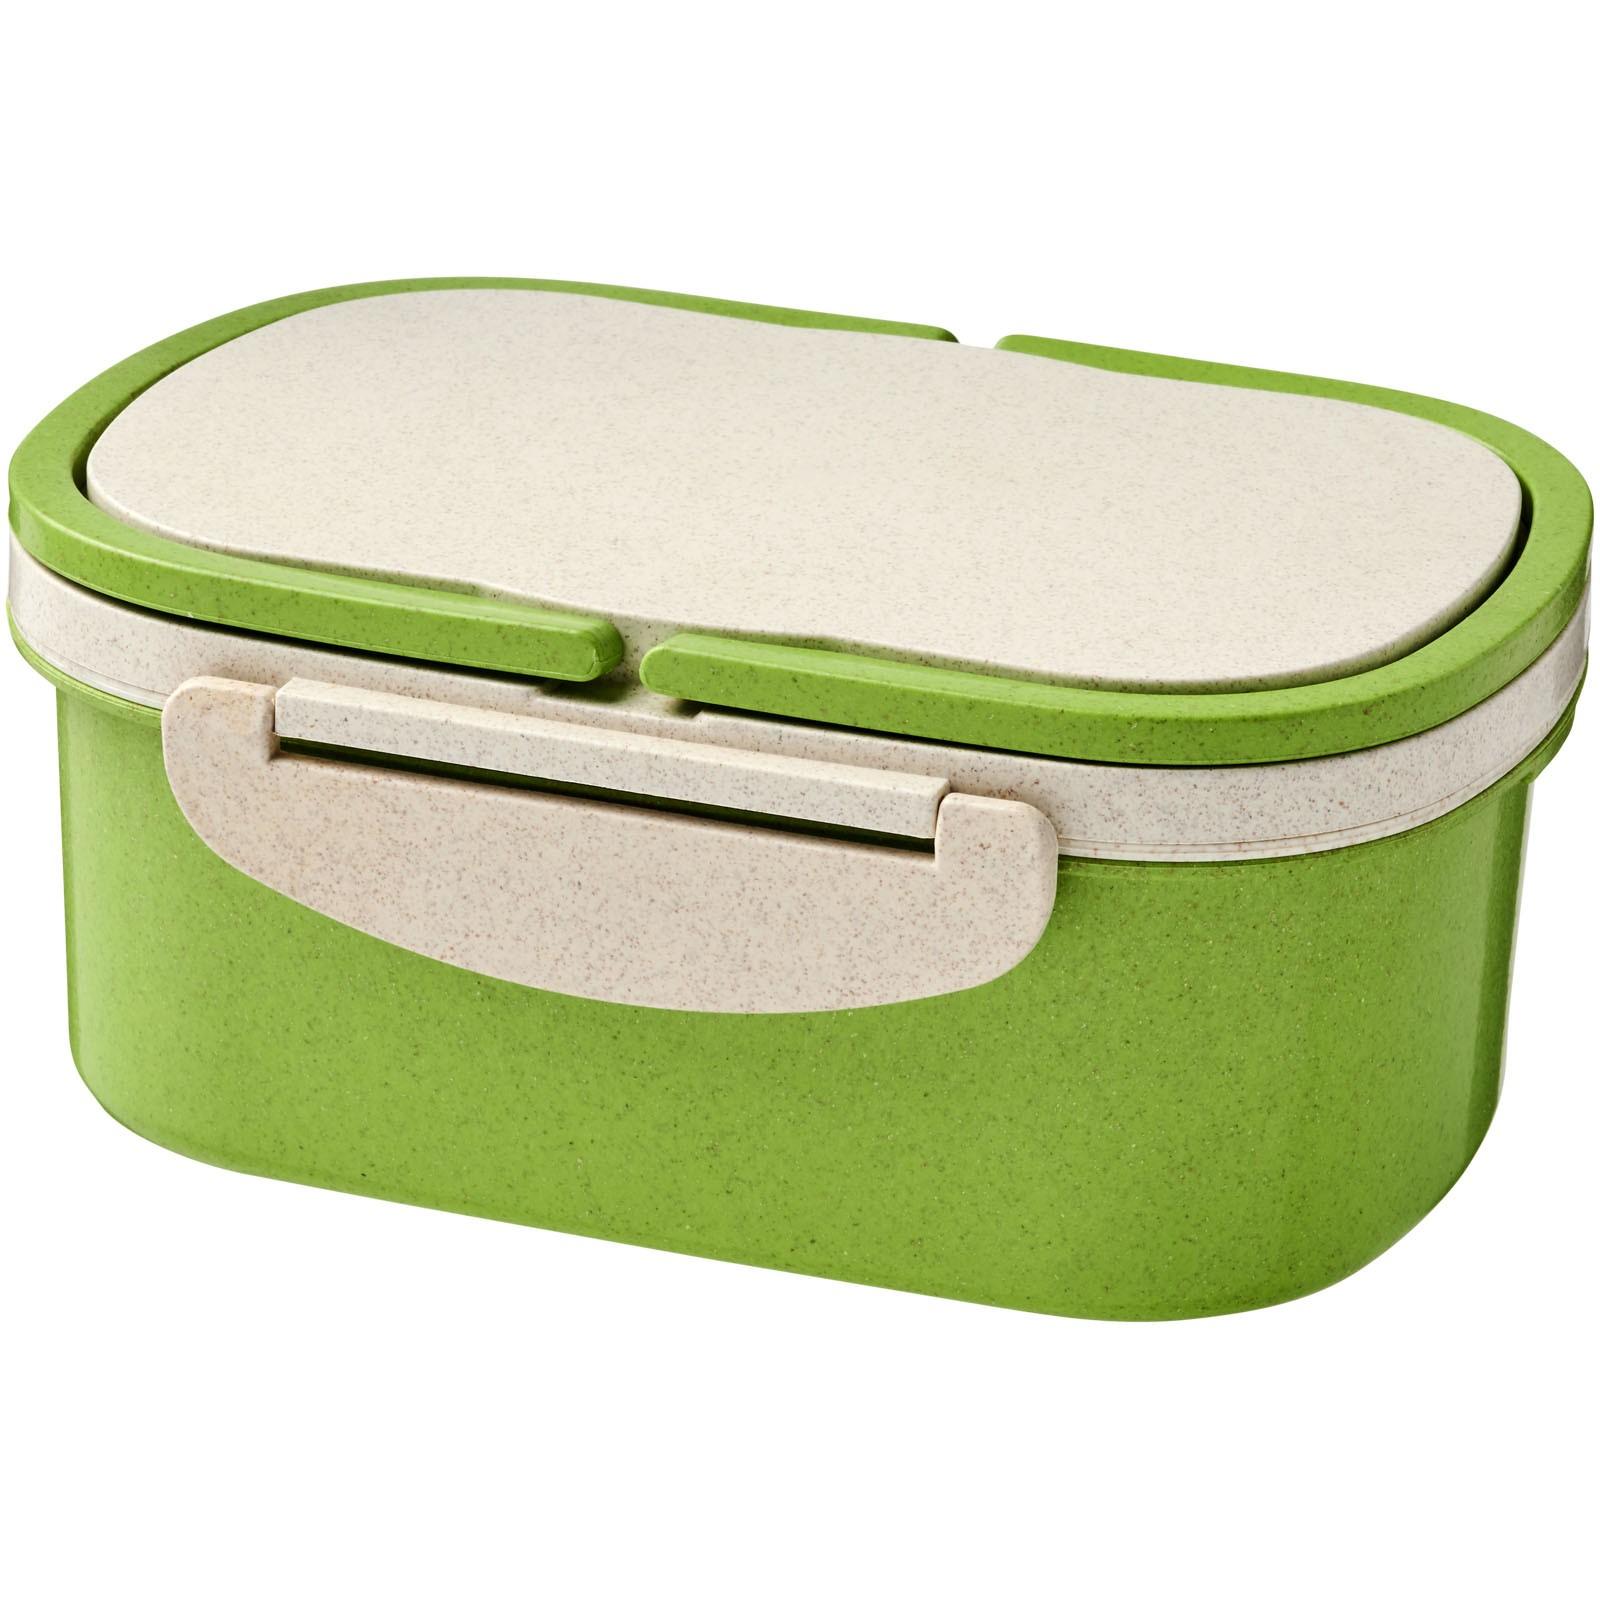 Krabička na svačinu z pšeničné slámy Crave - Limetka